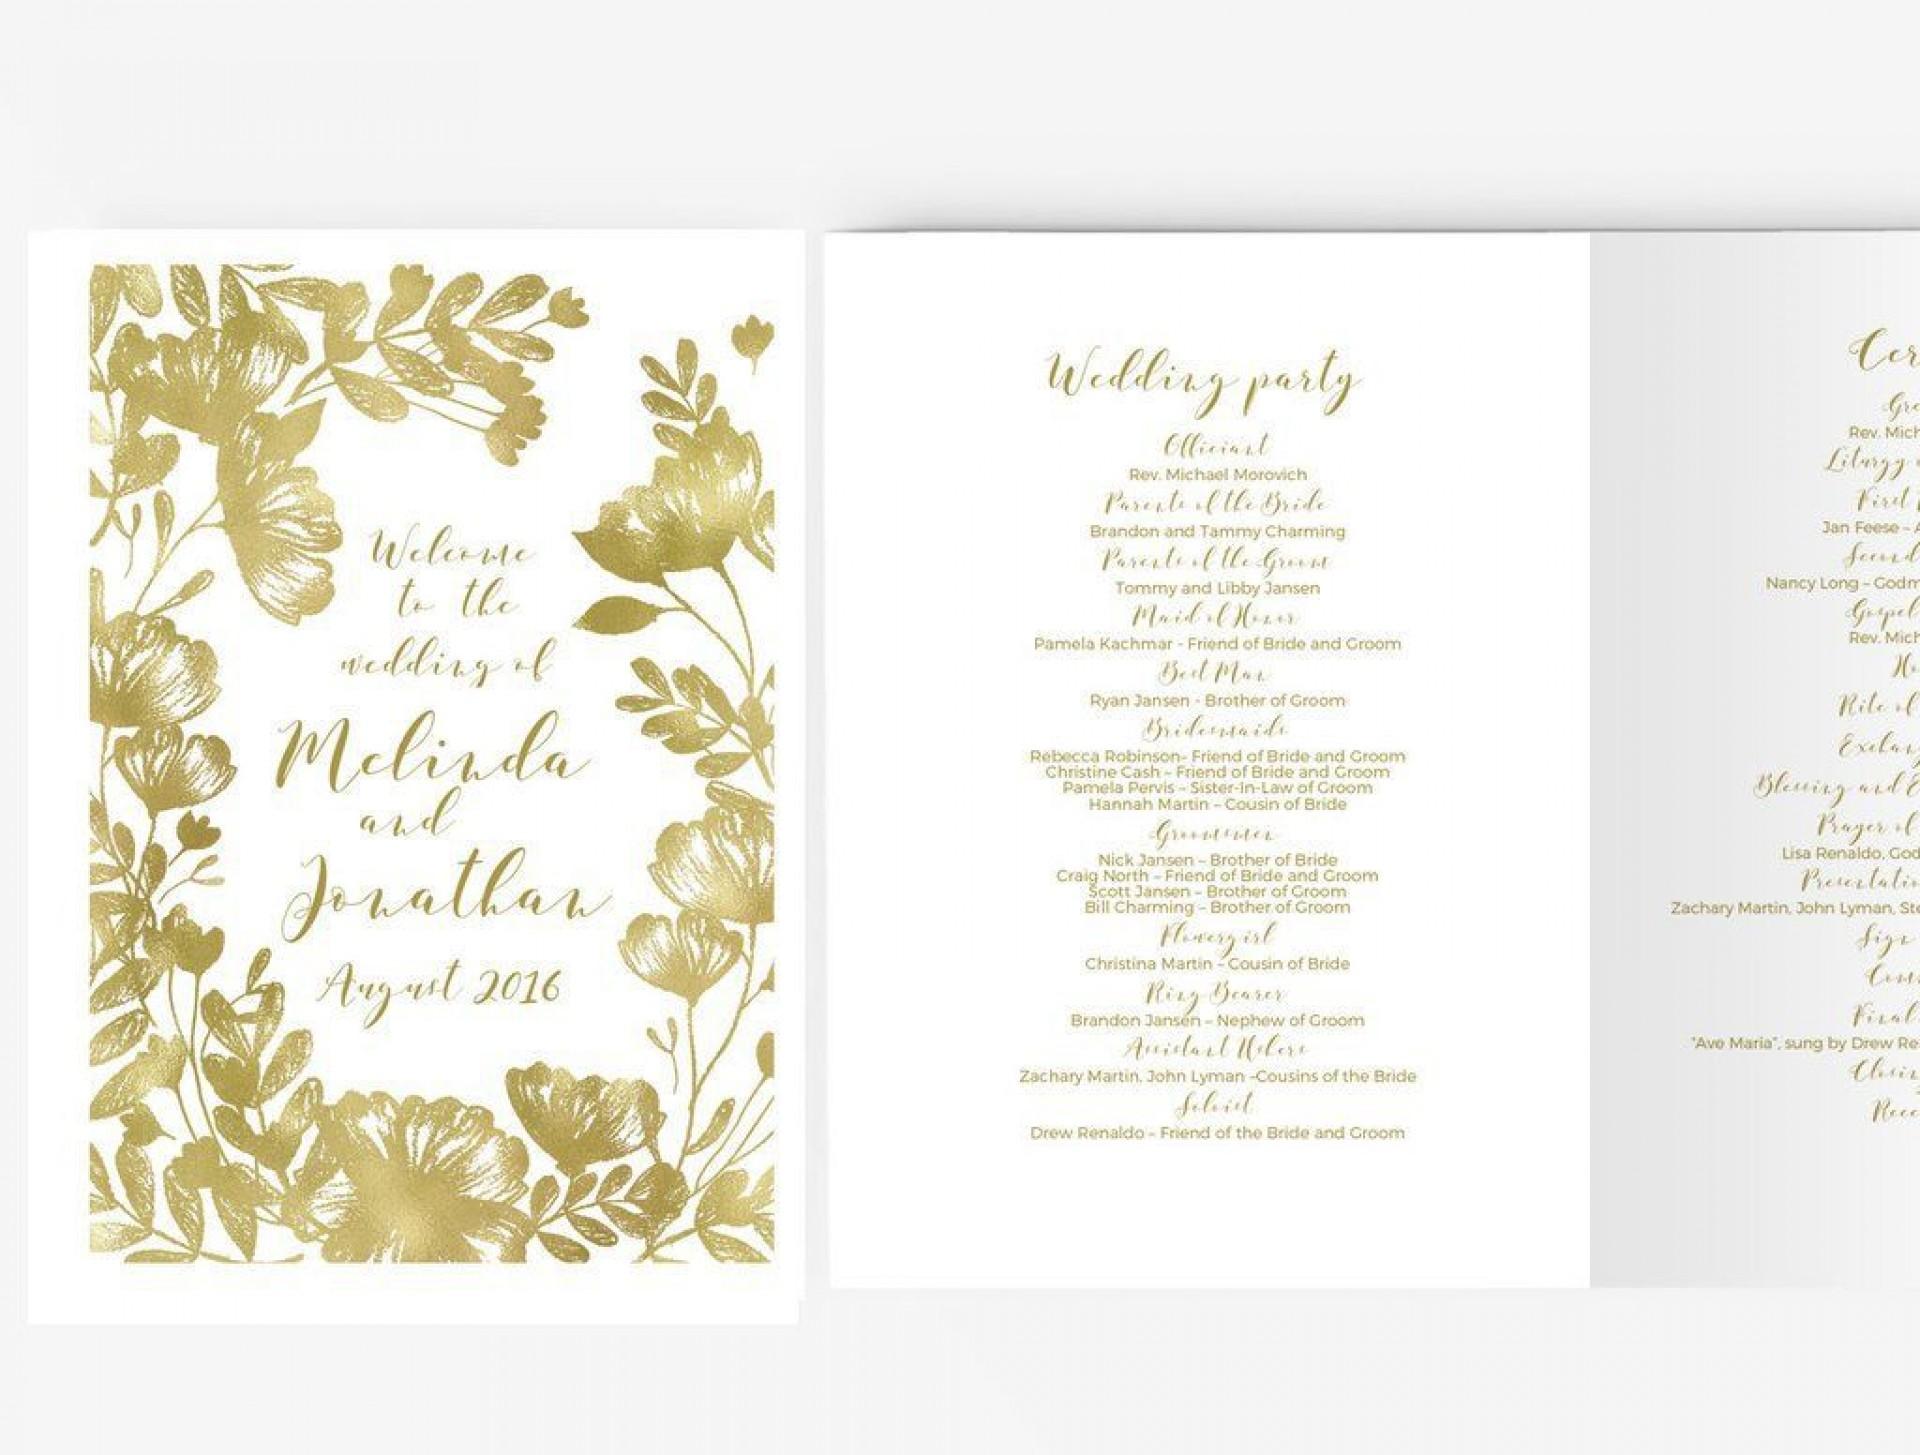 004 Impressive Free Word Template For Wedding Program Highest Quality  Programs1920